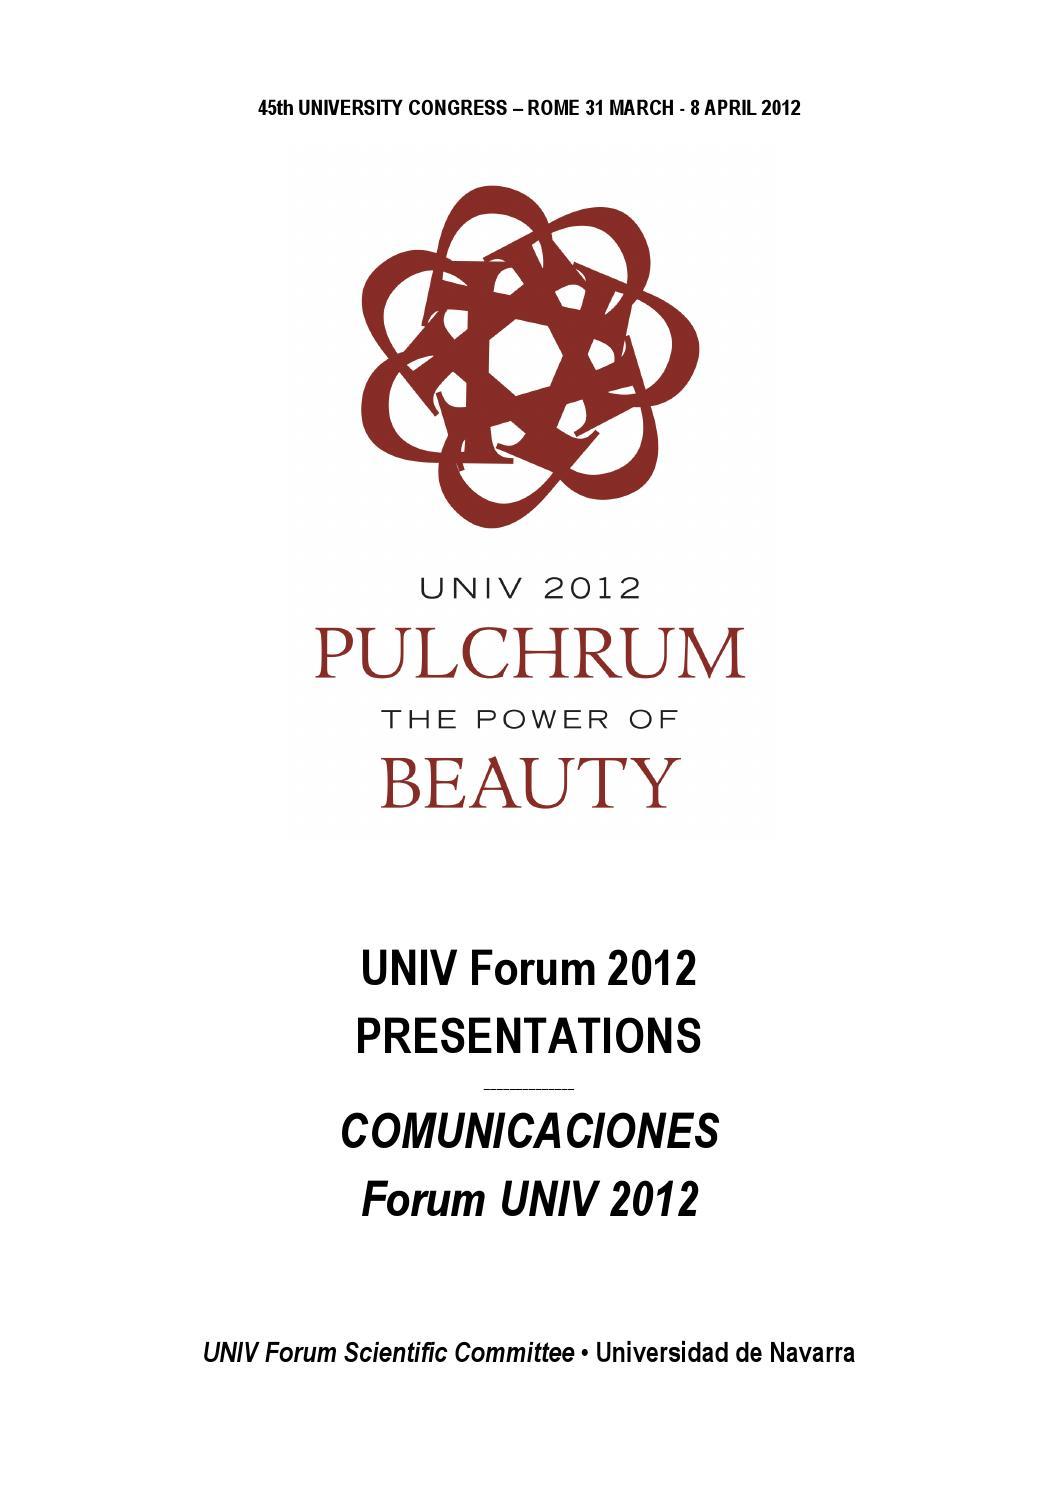 UNIV Forum 2012 \